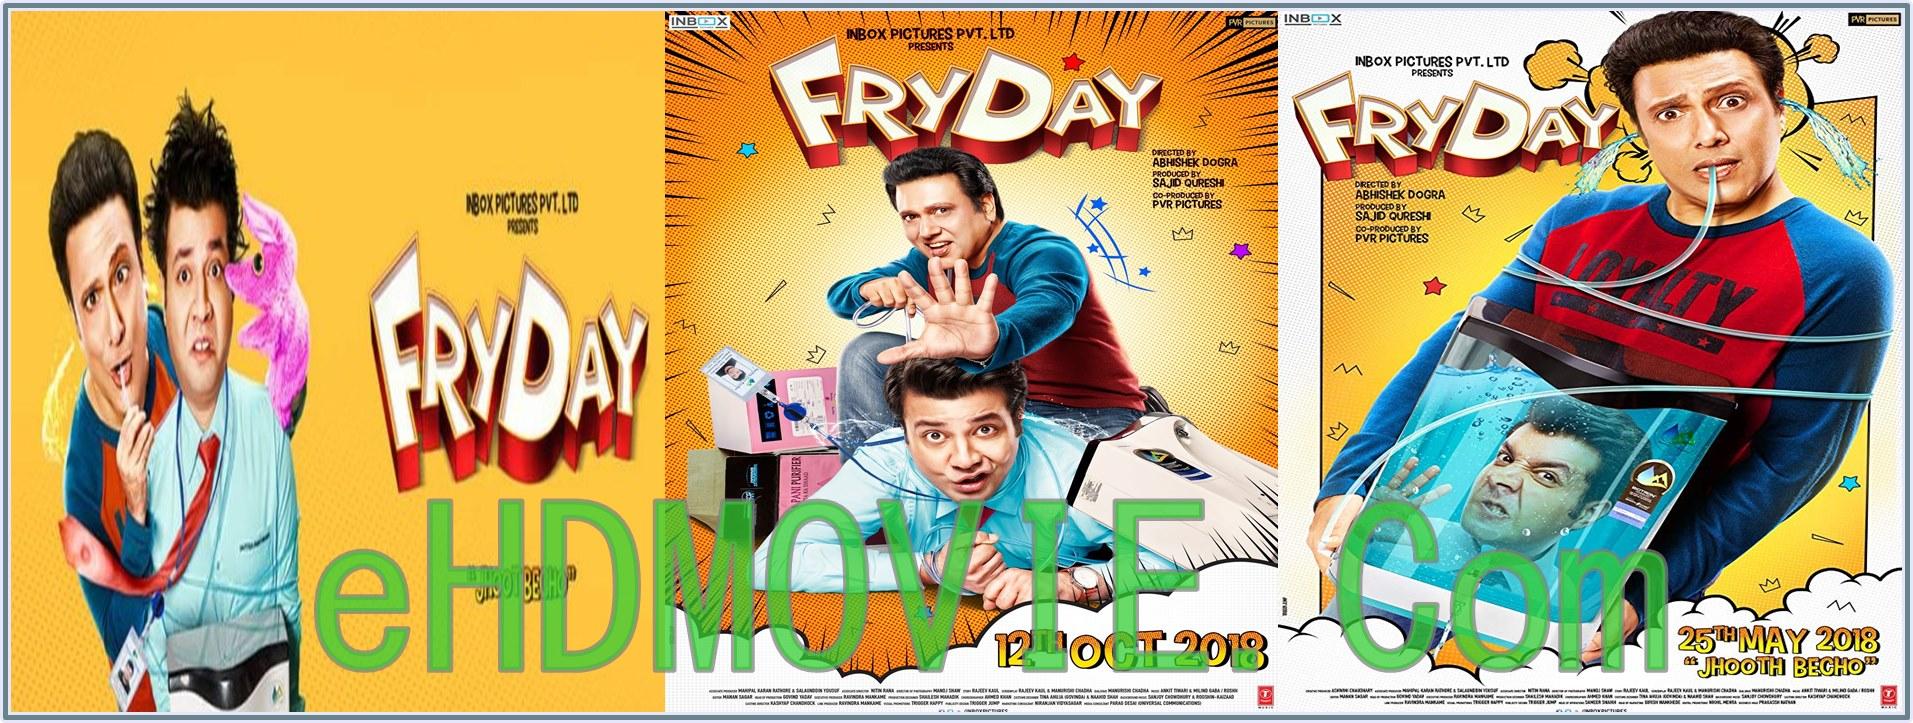 FryDay 2018 Full Movie Hindi 1080p – 720p – HEVC – 480p ORG WEB-DL 300MB – 500MB – 850MB – 2GB ESubs Free Download